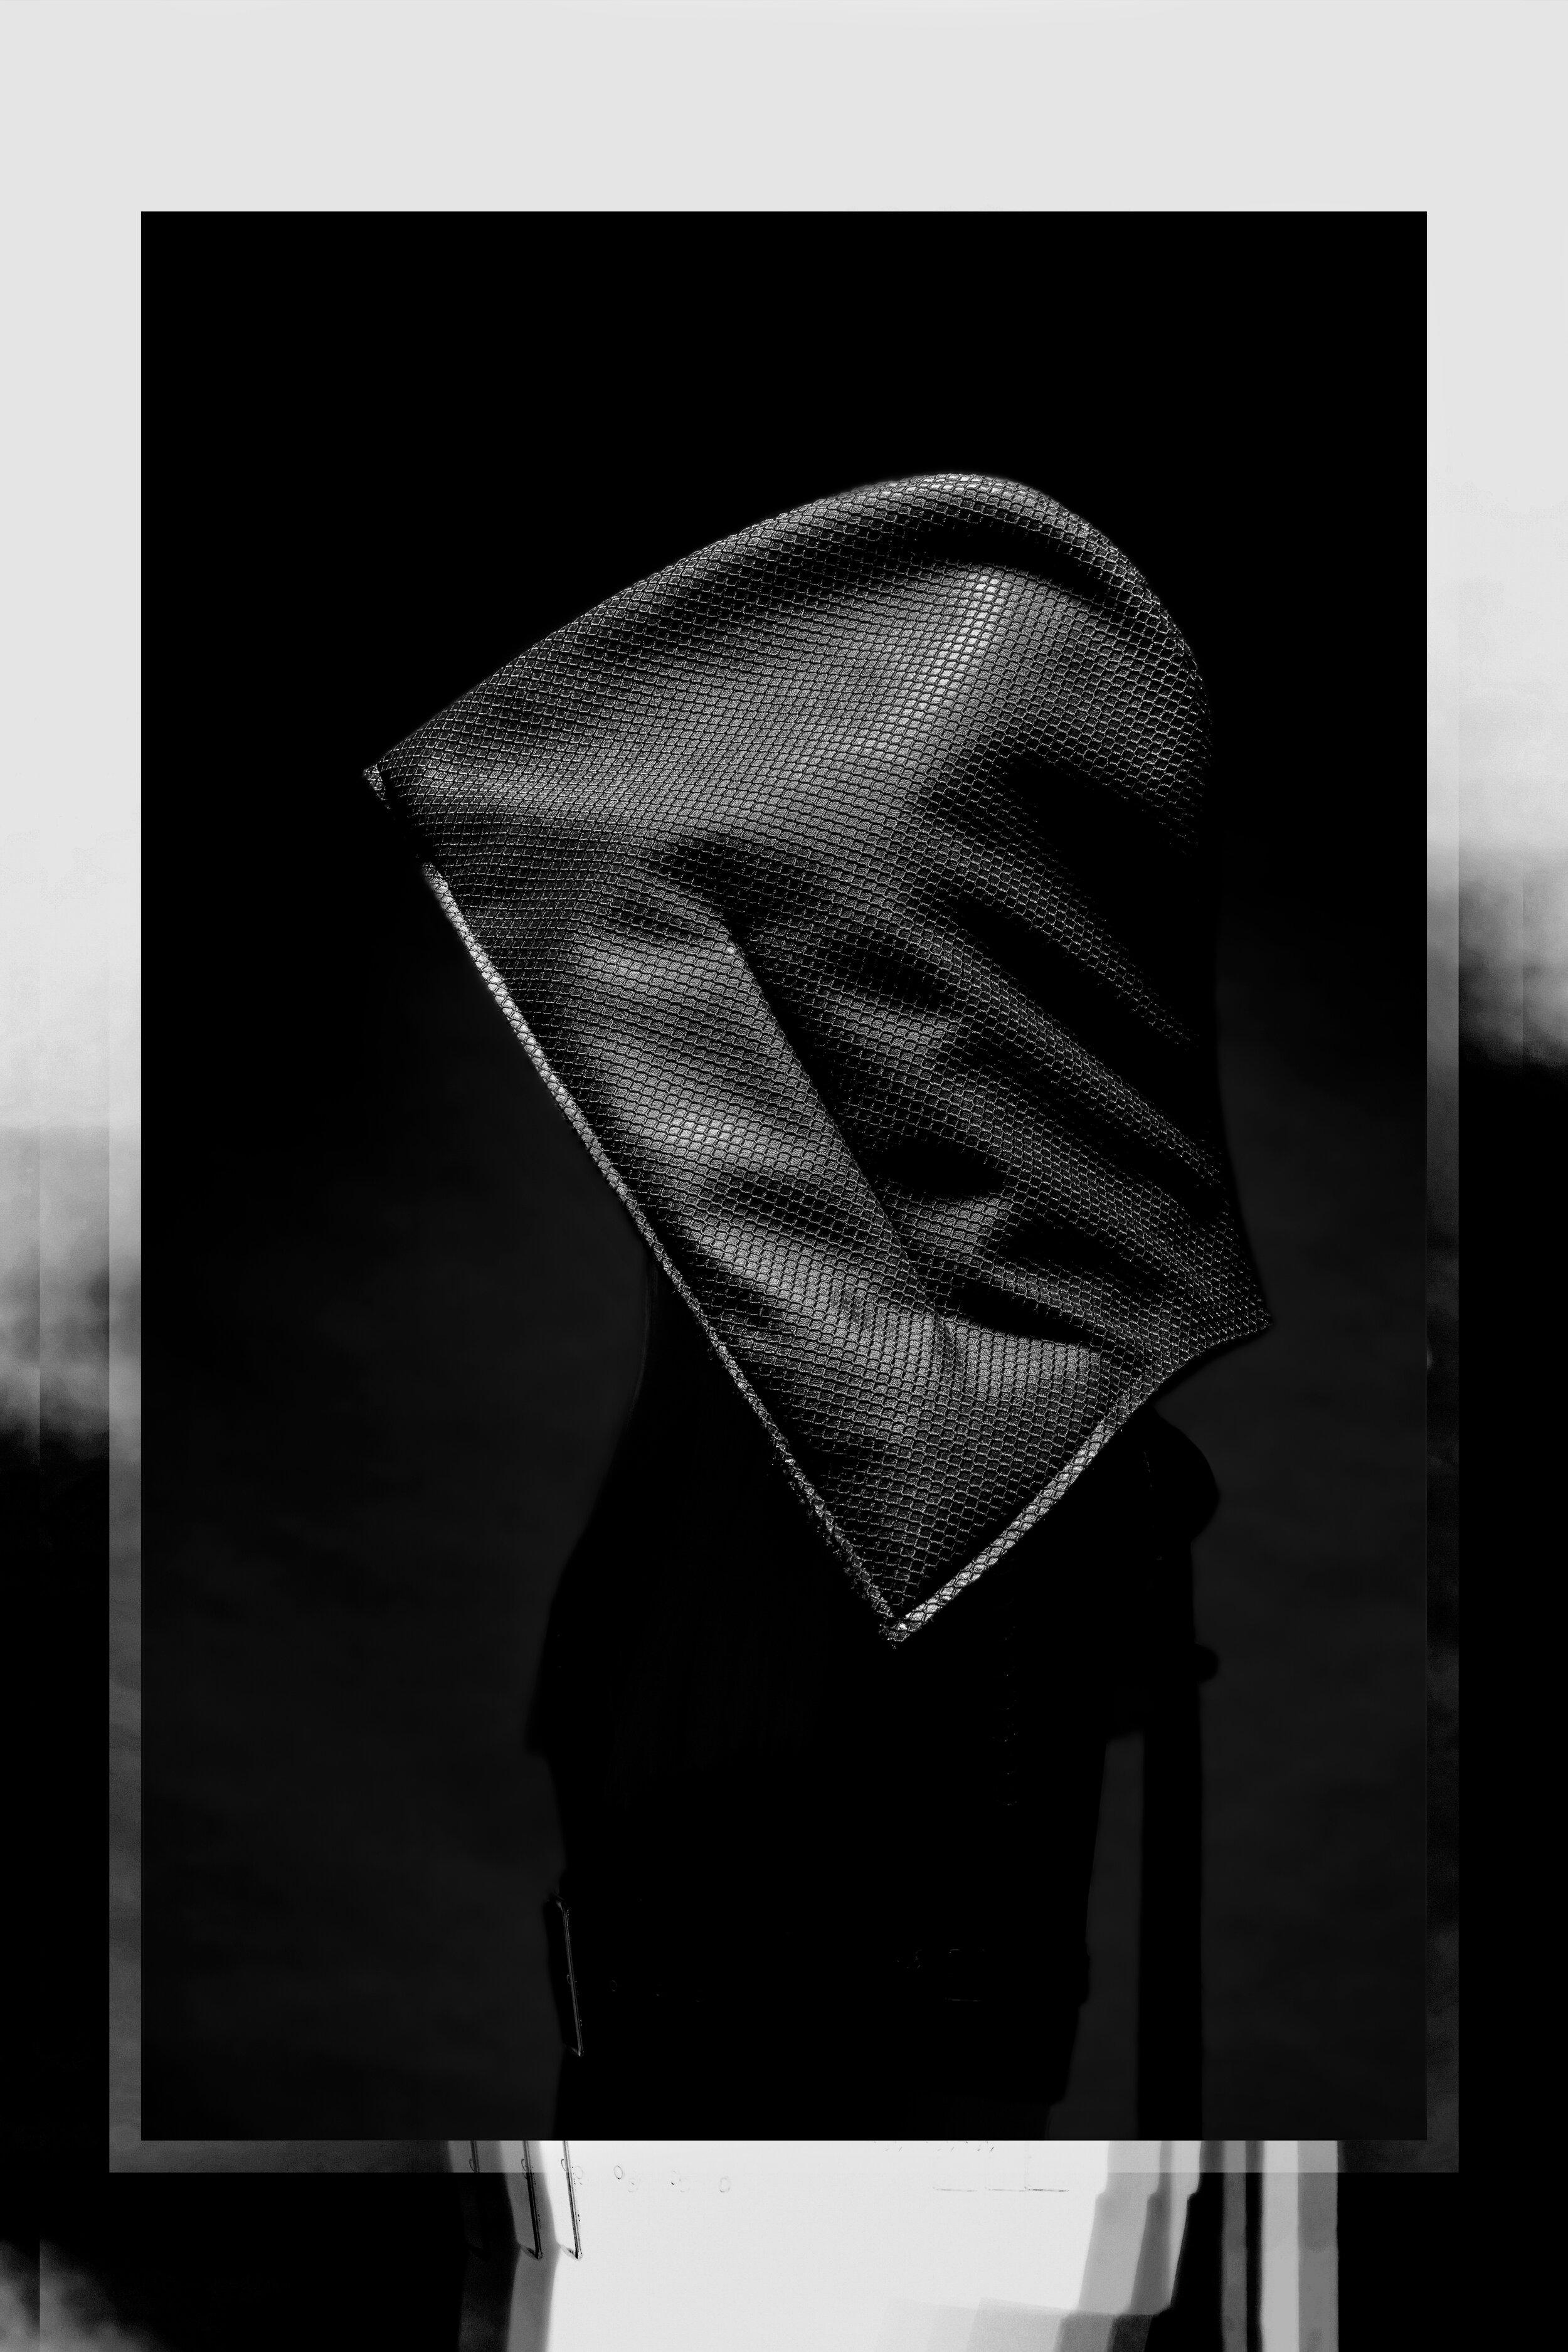 Io wearing Comme de Garçons - London, 2019